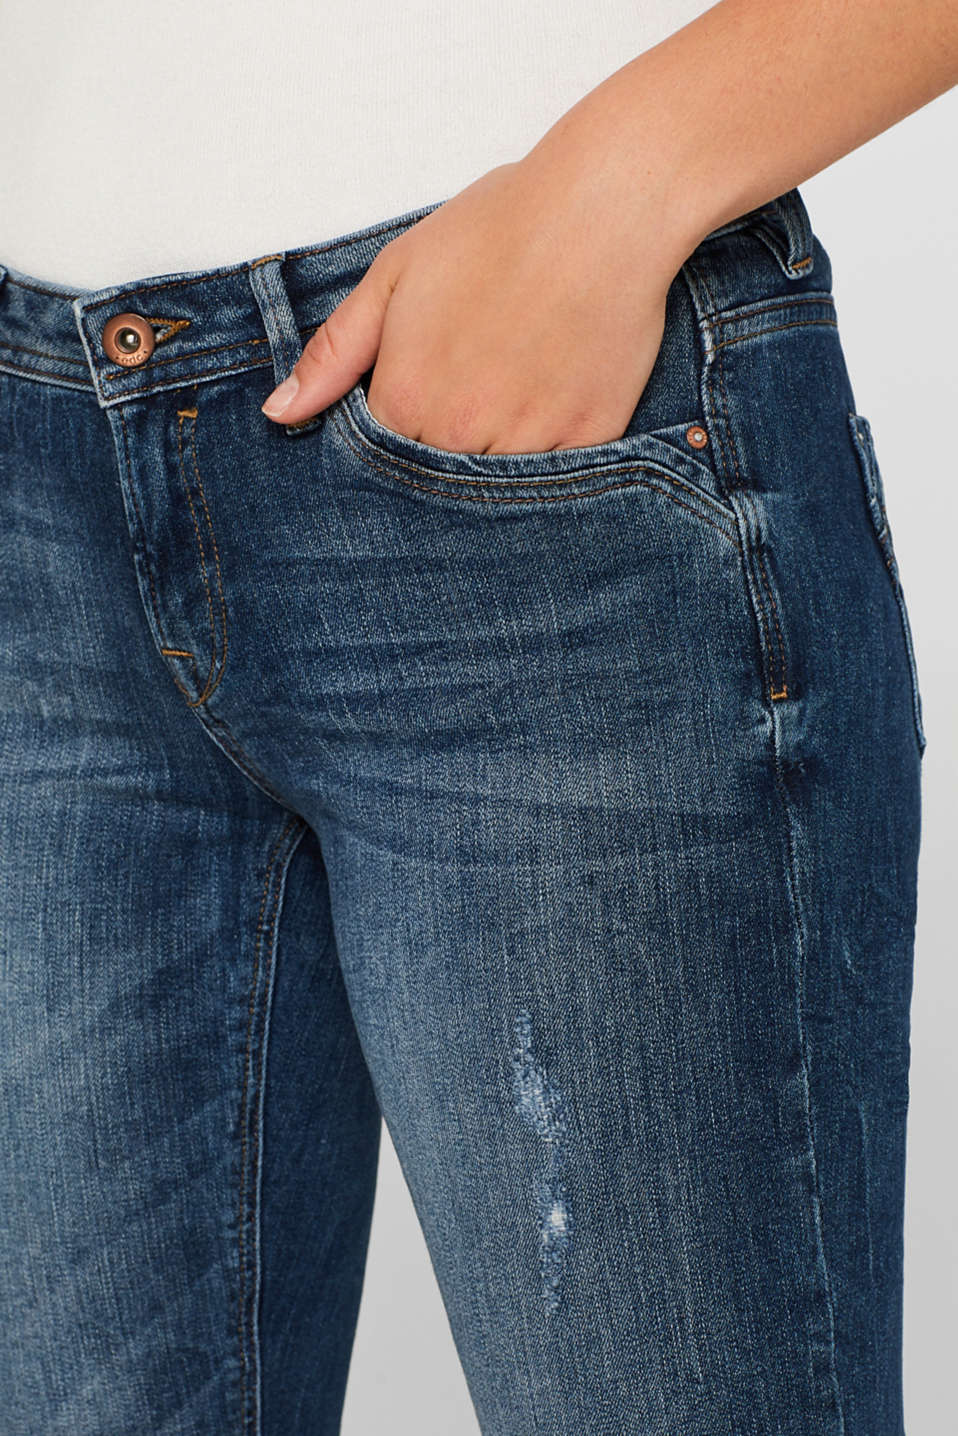 Pants denim, BLUE DARK WASH, detail image number 2